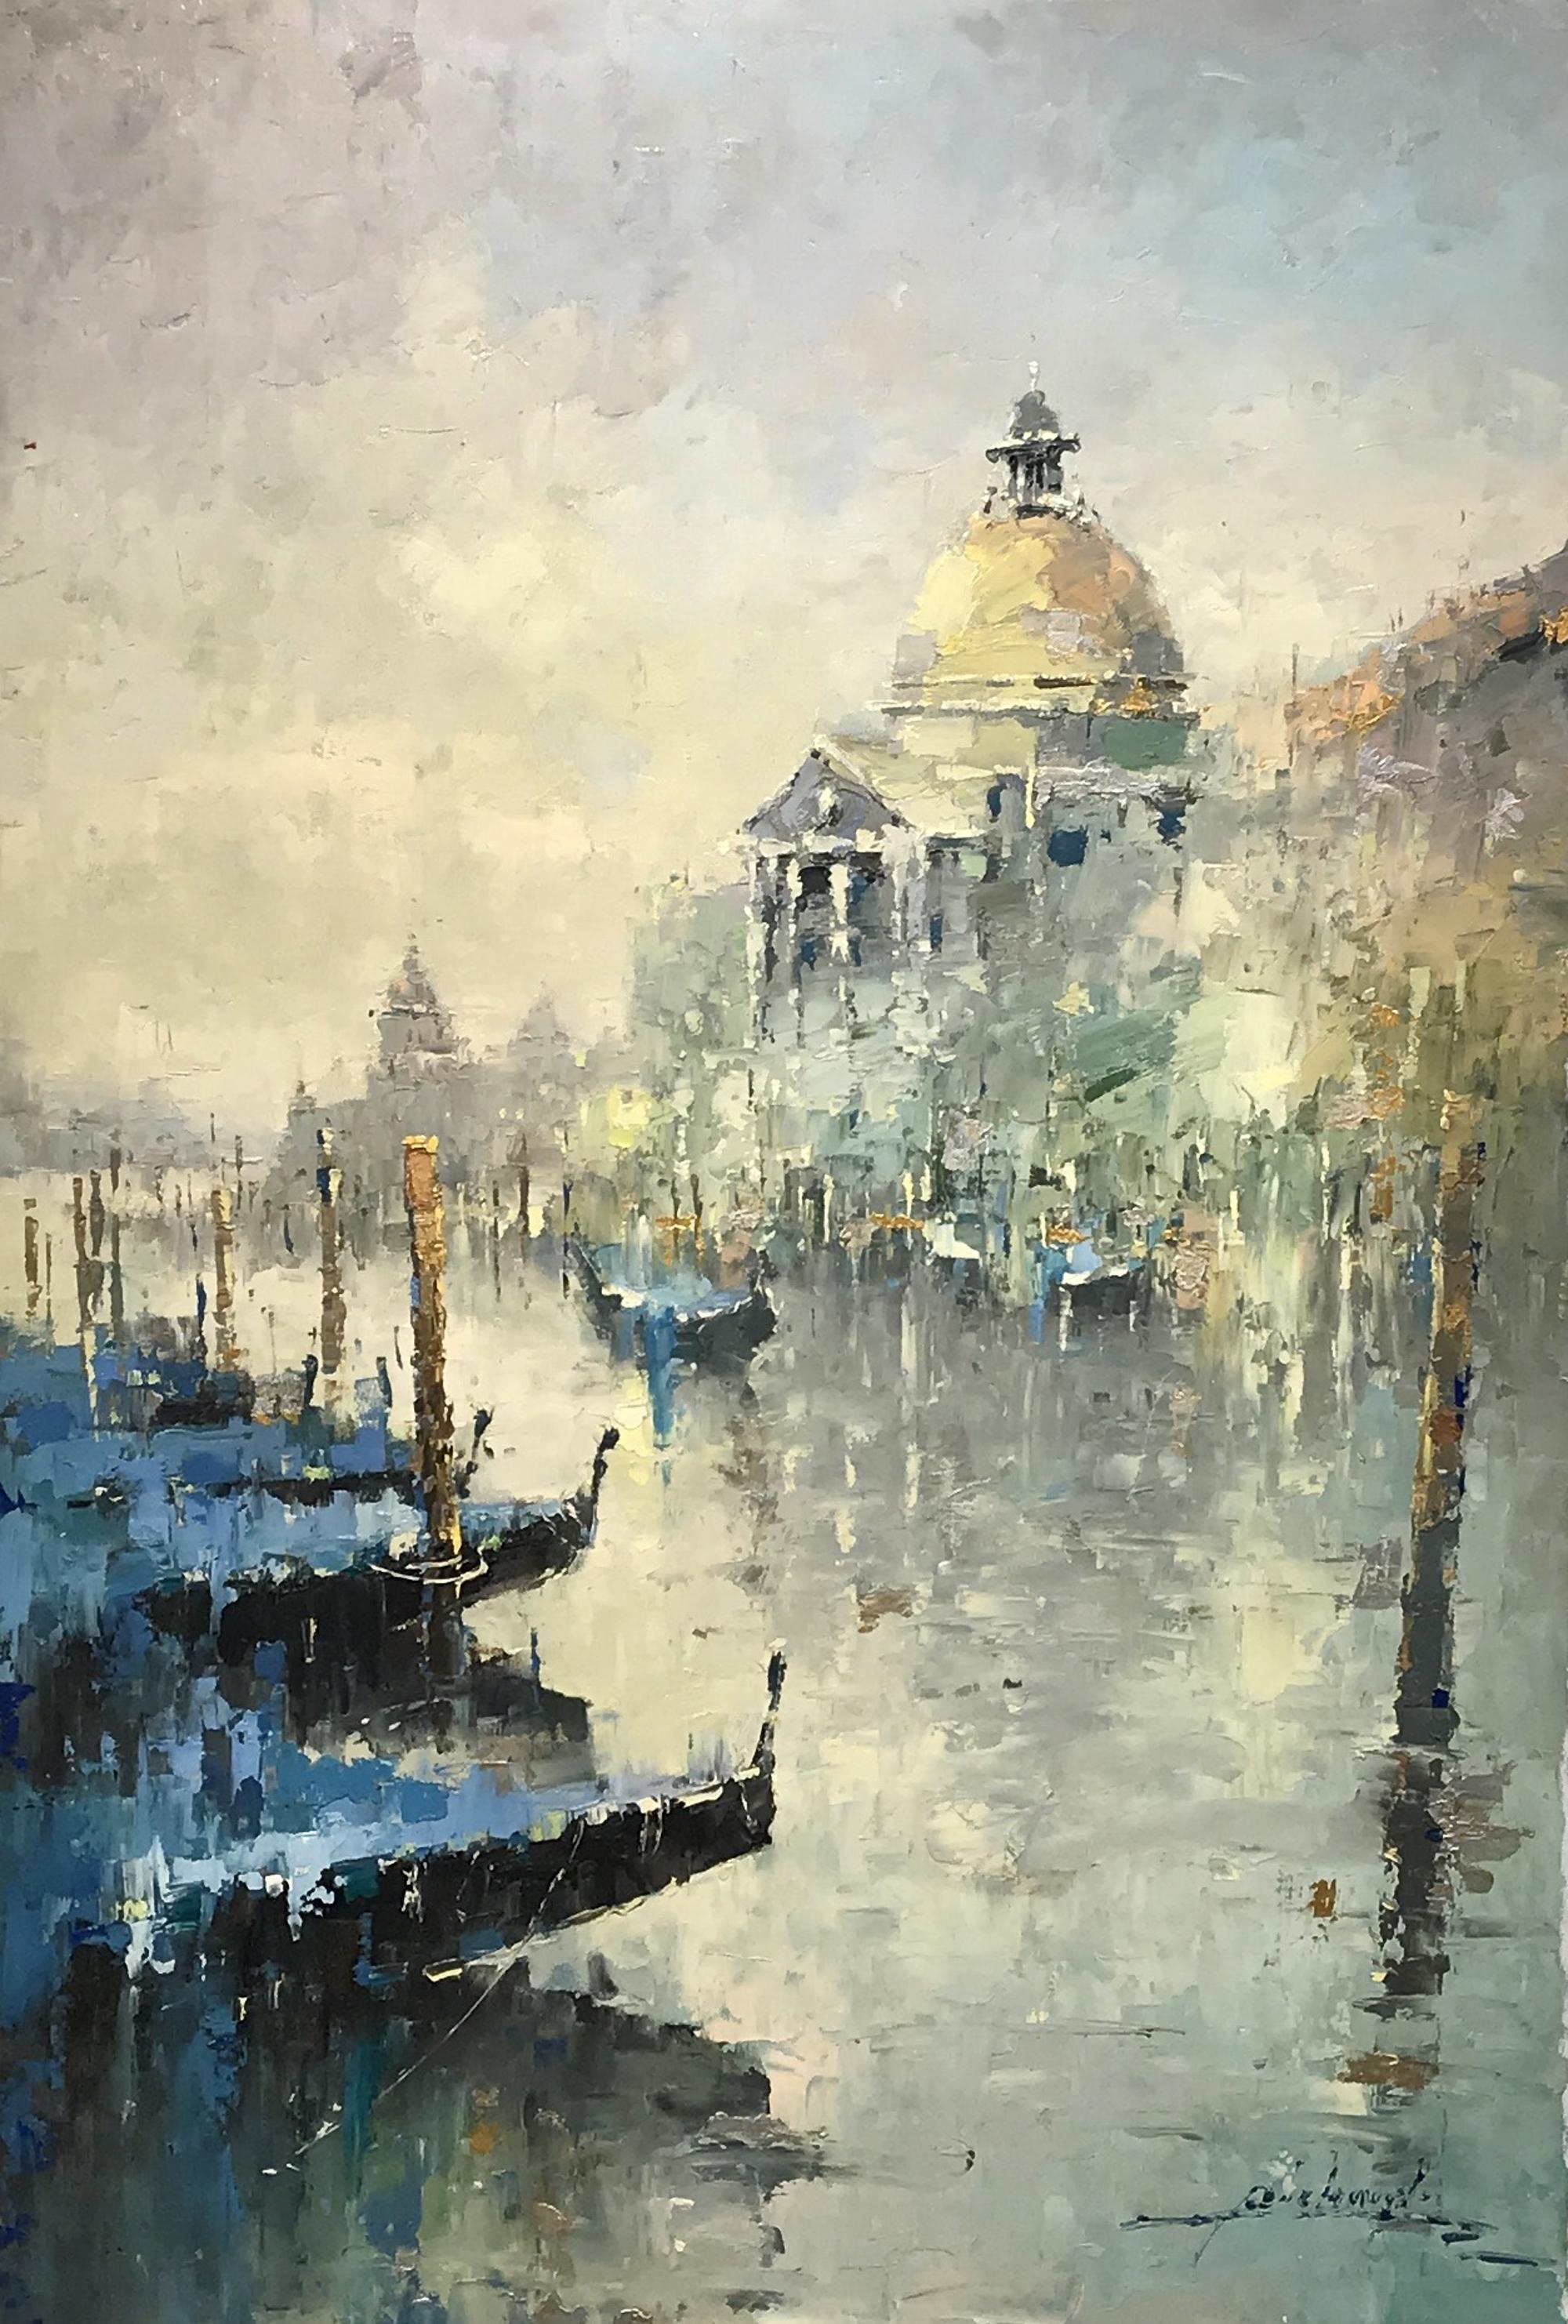 VENICE WATERWAY by PICHARD